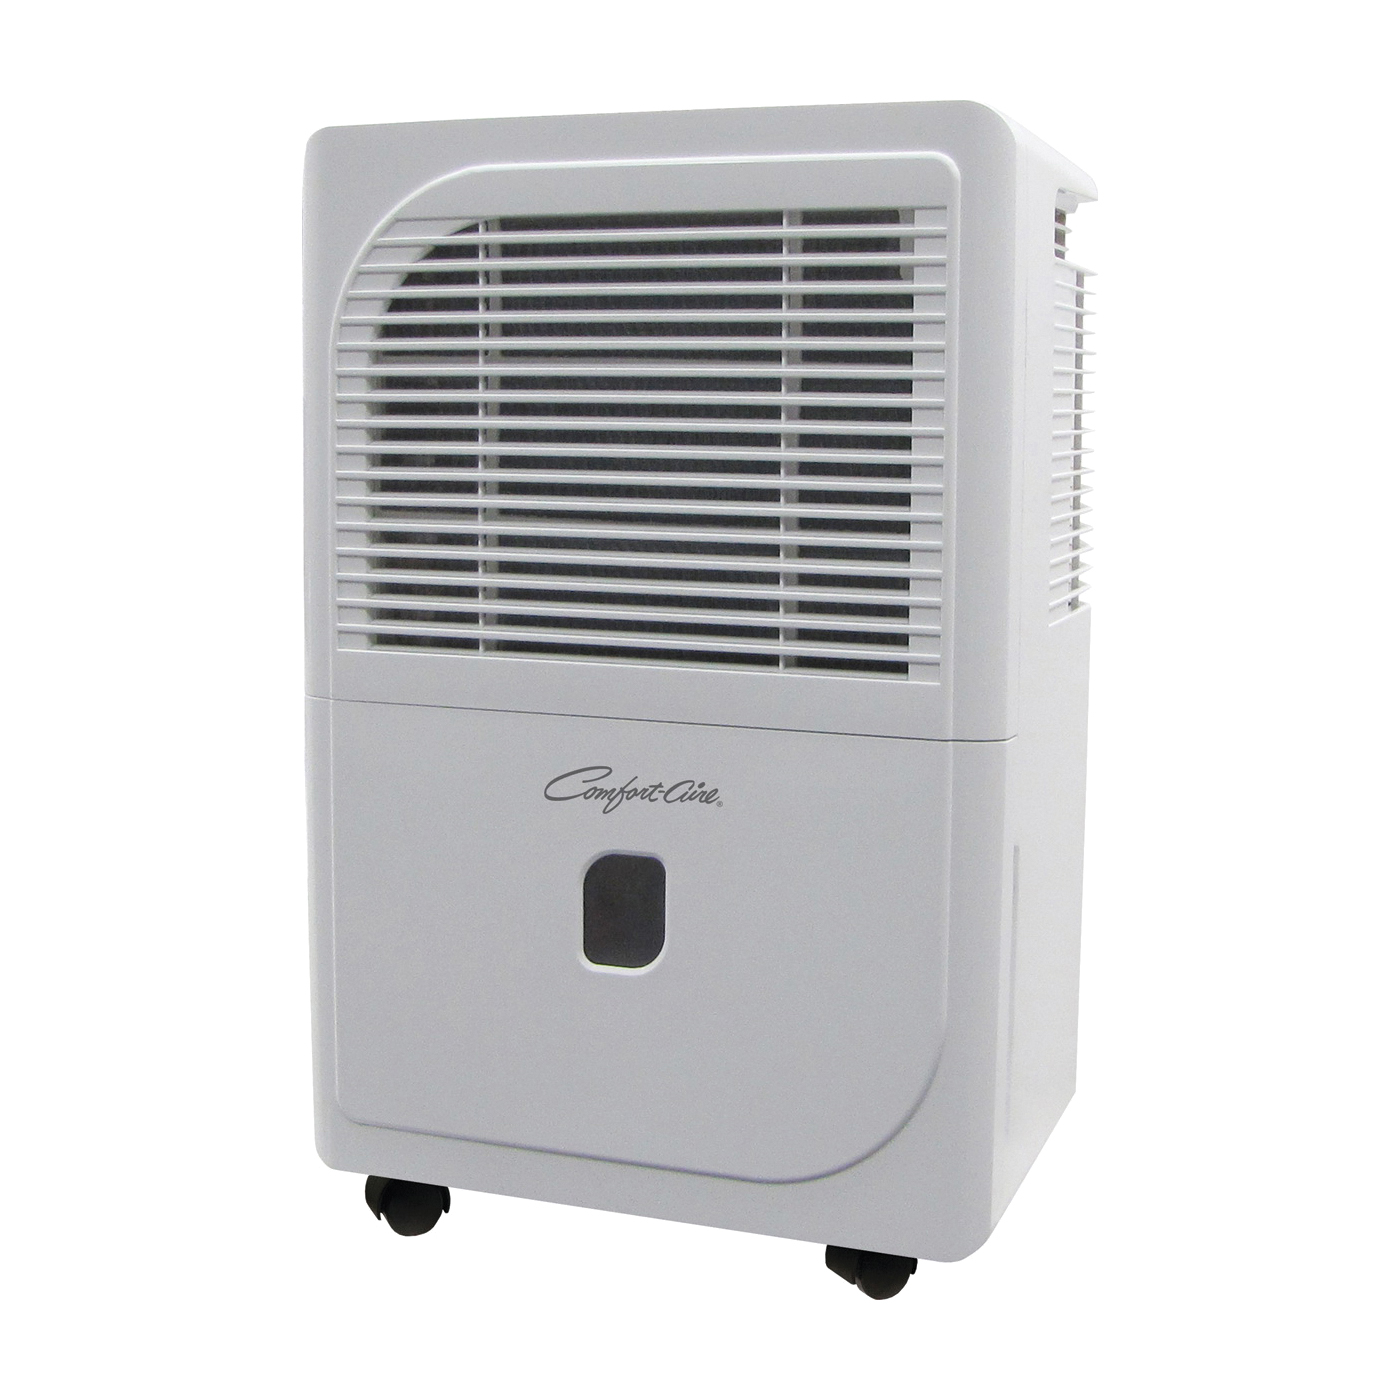 Comfort-Aire BHDP-701-J